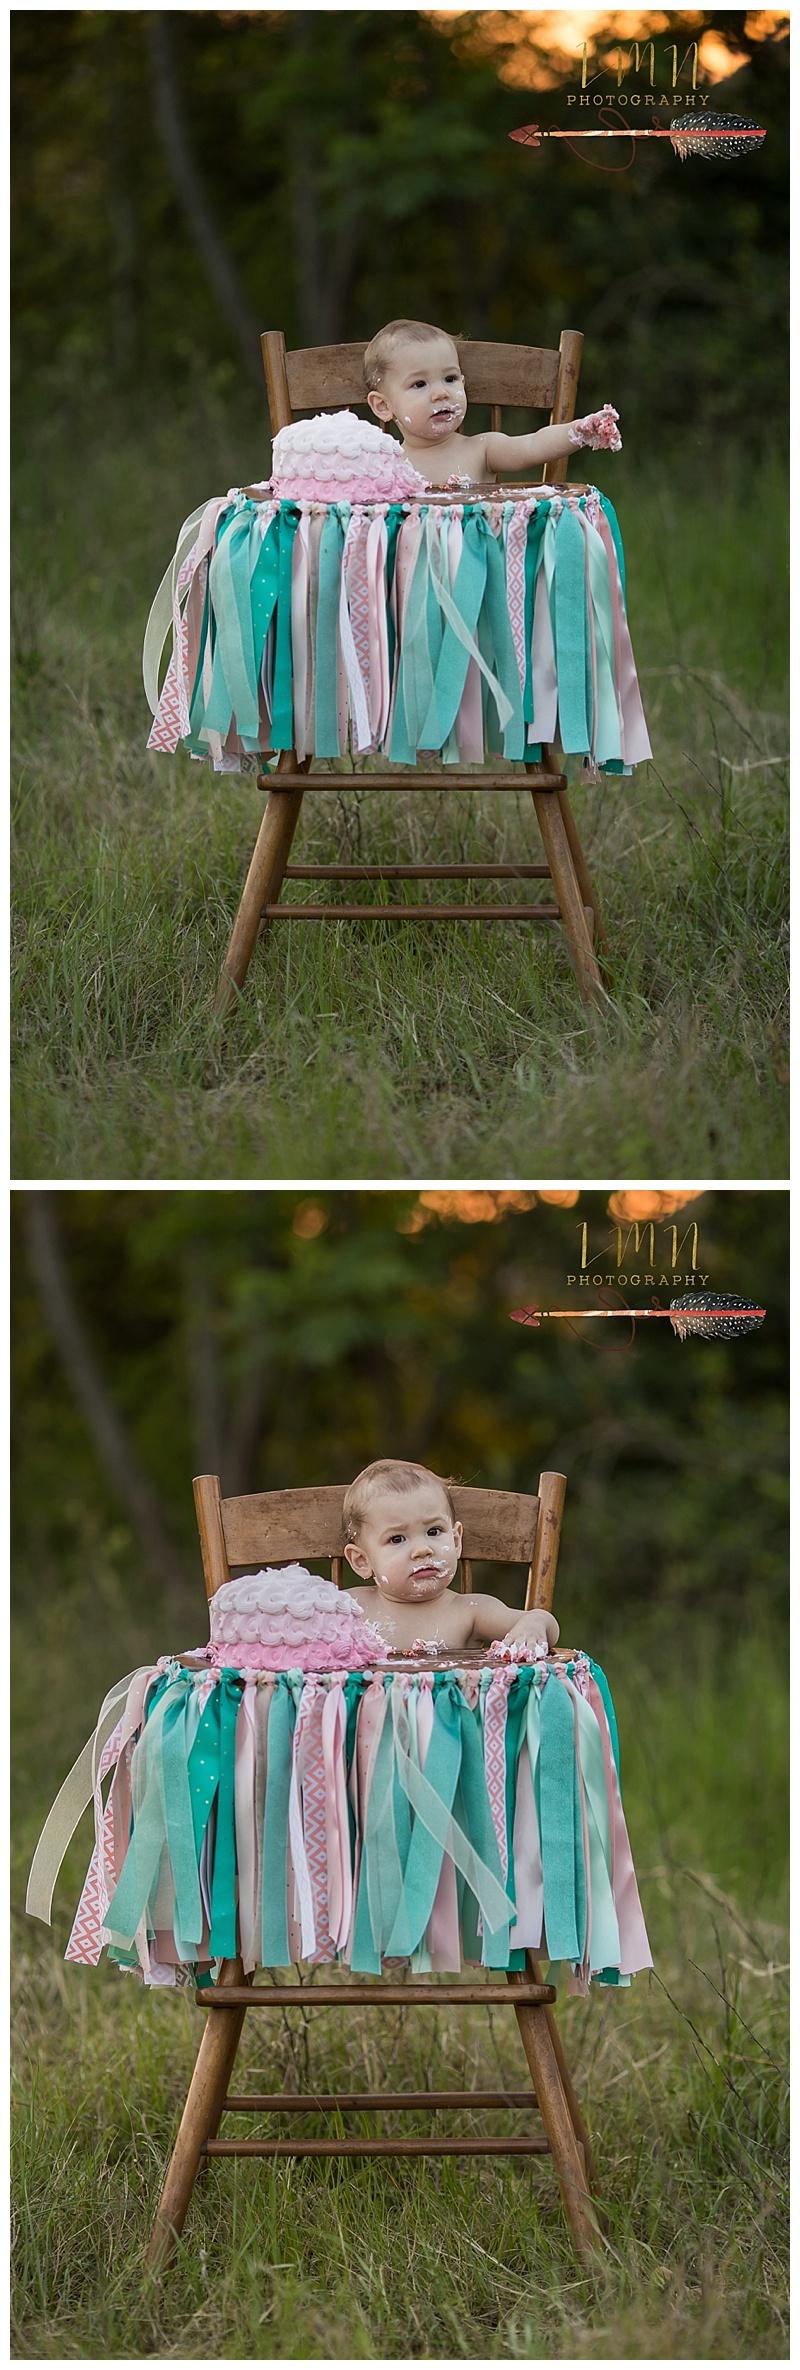 Katy Texas Family Photographer 77494